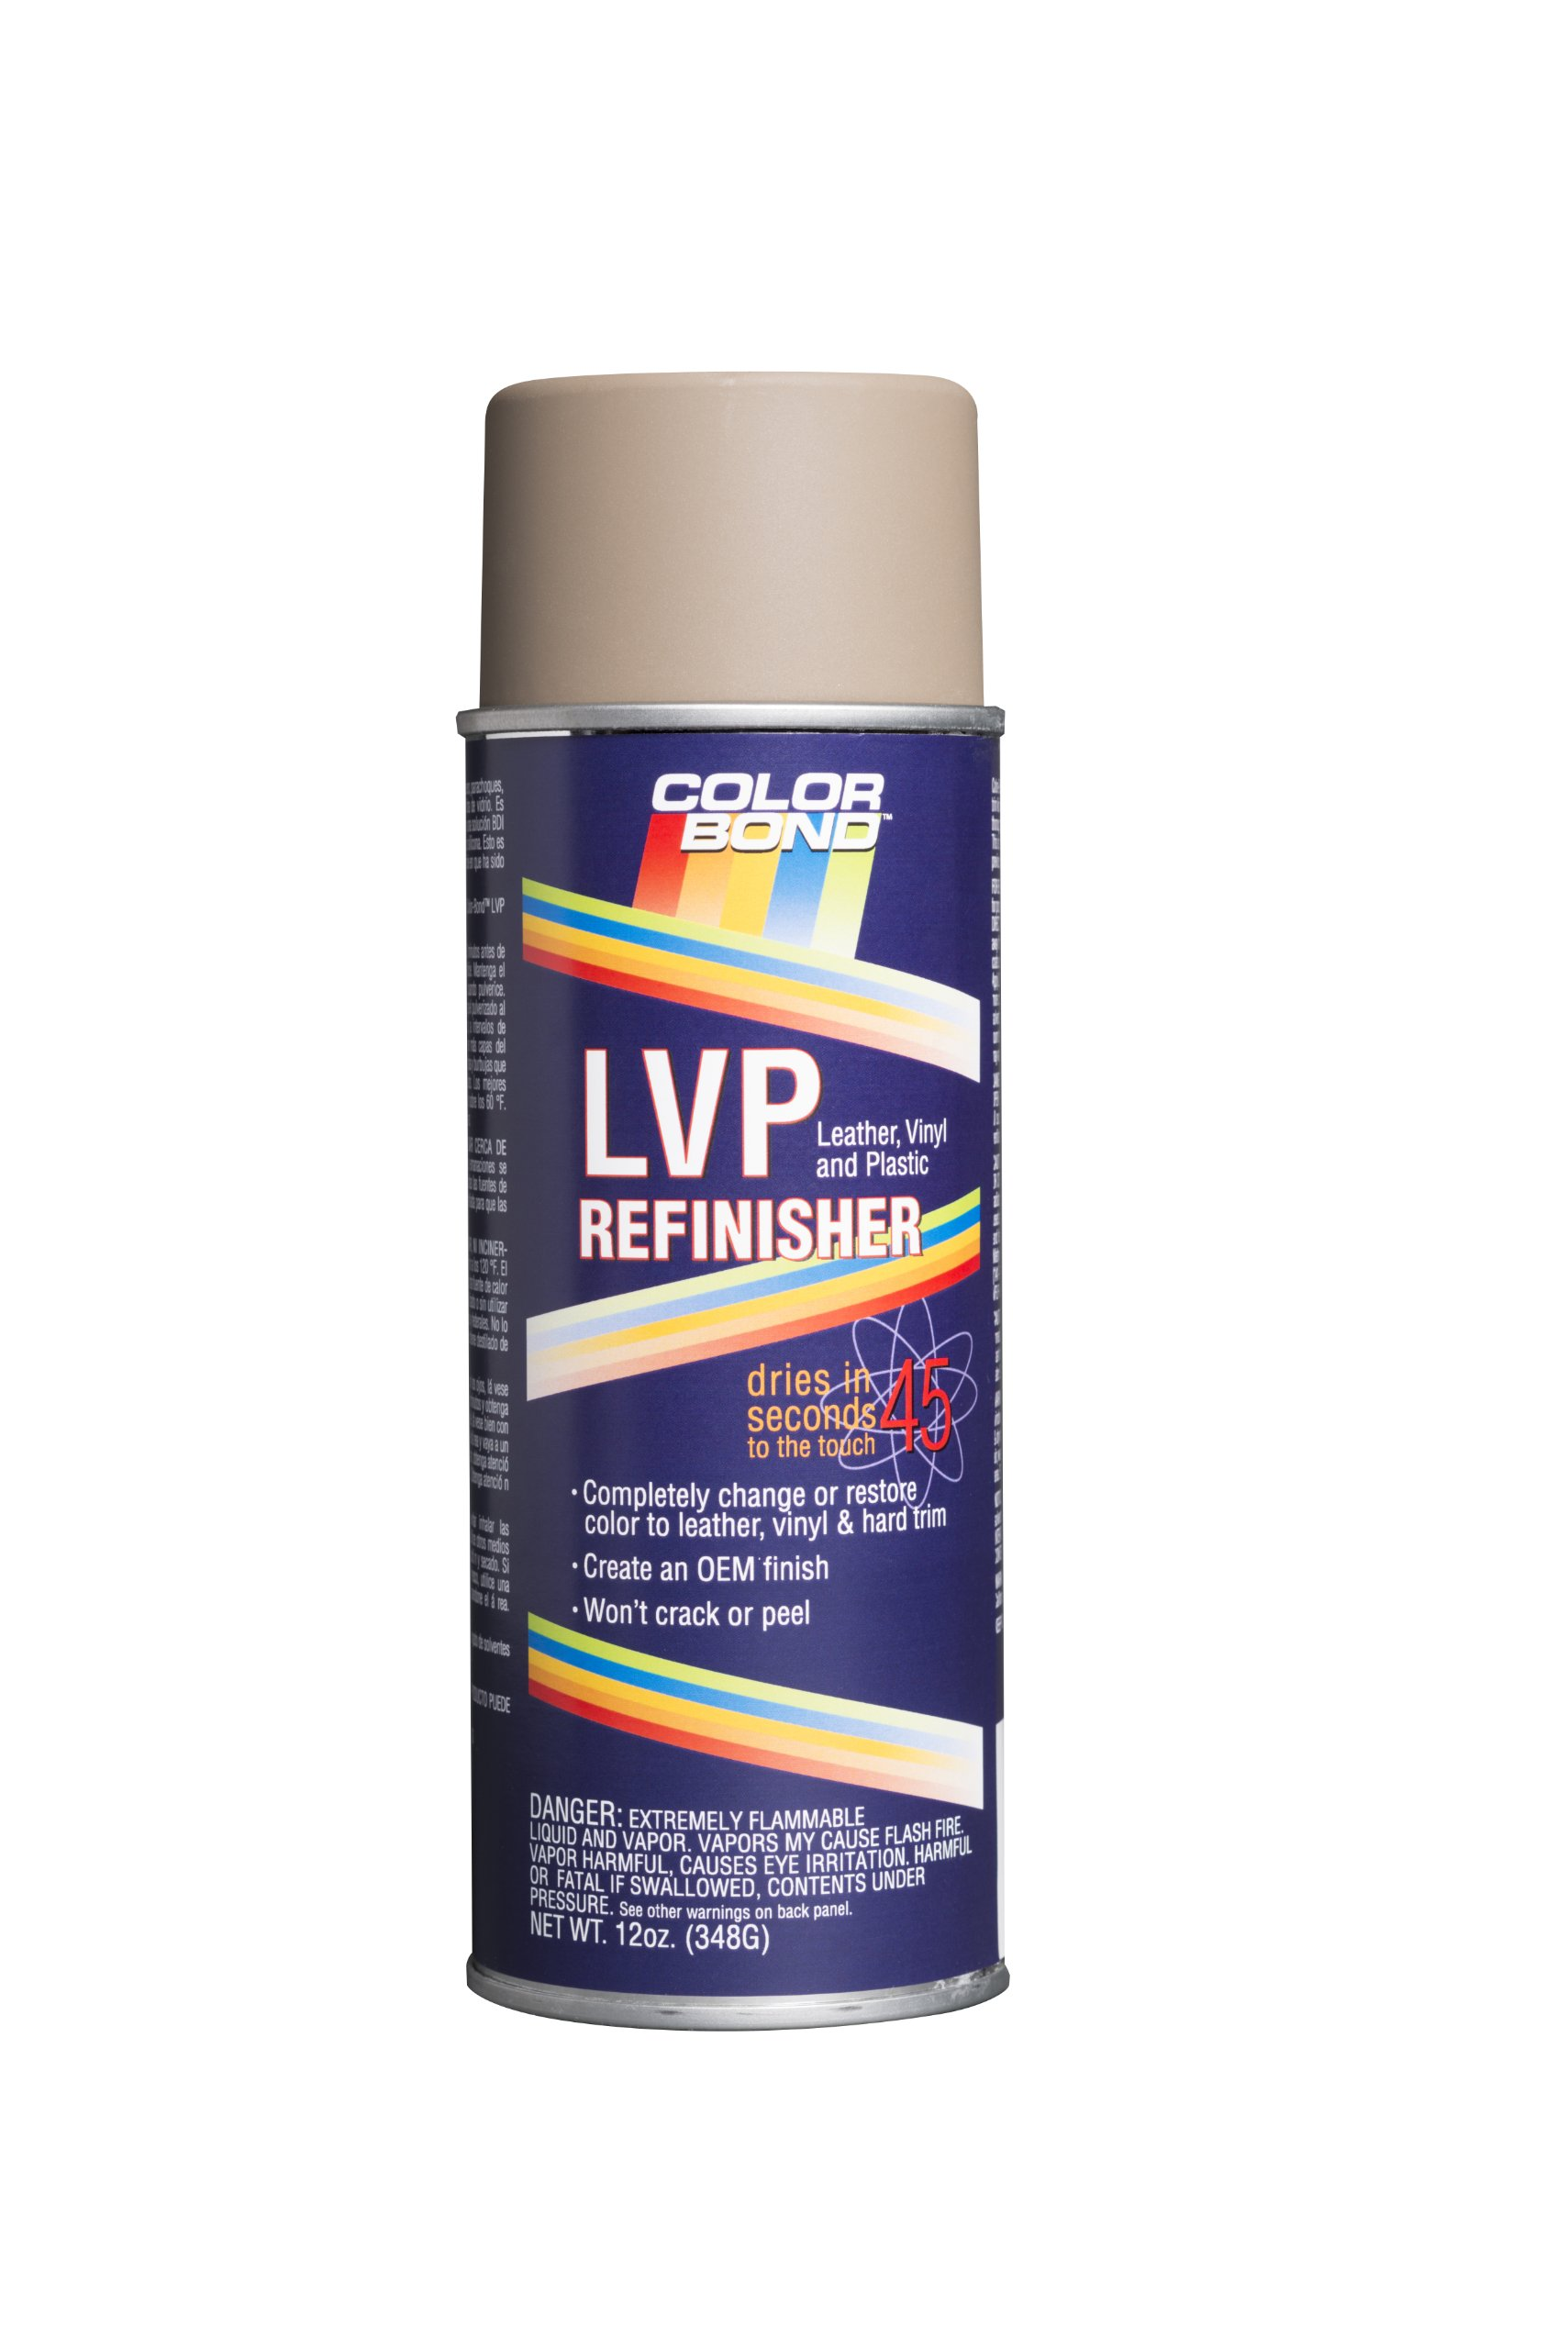 ColorBond (258) BMW Black LVP Leather, Vinyl & Hard Plastic Refinisher Spray Paint - 12 oz.